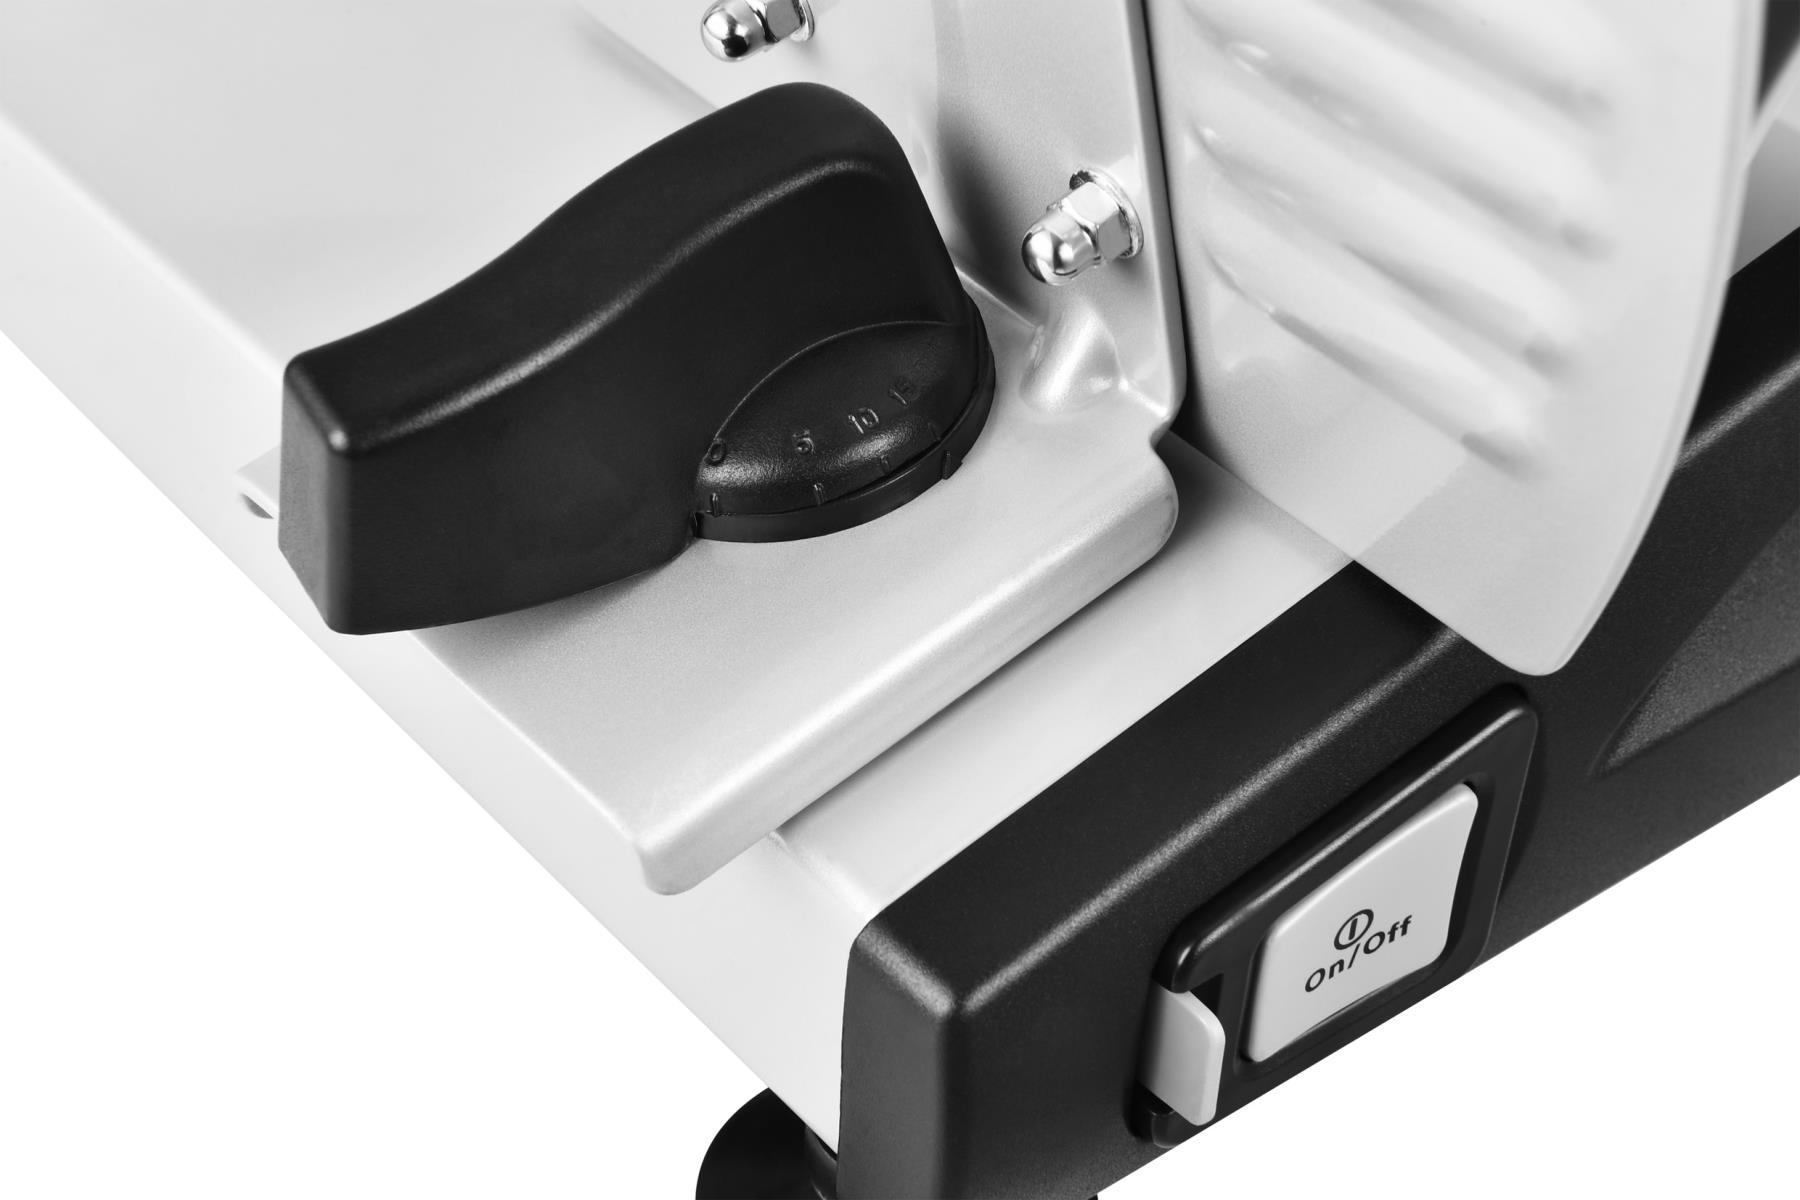 Metall Allesschneider Brotschneidemaschine Edelstahlmesser 19cm Silber*57918 Bild 4